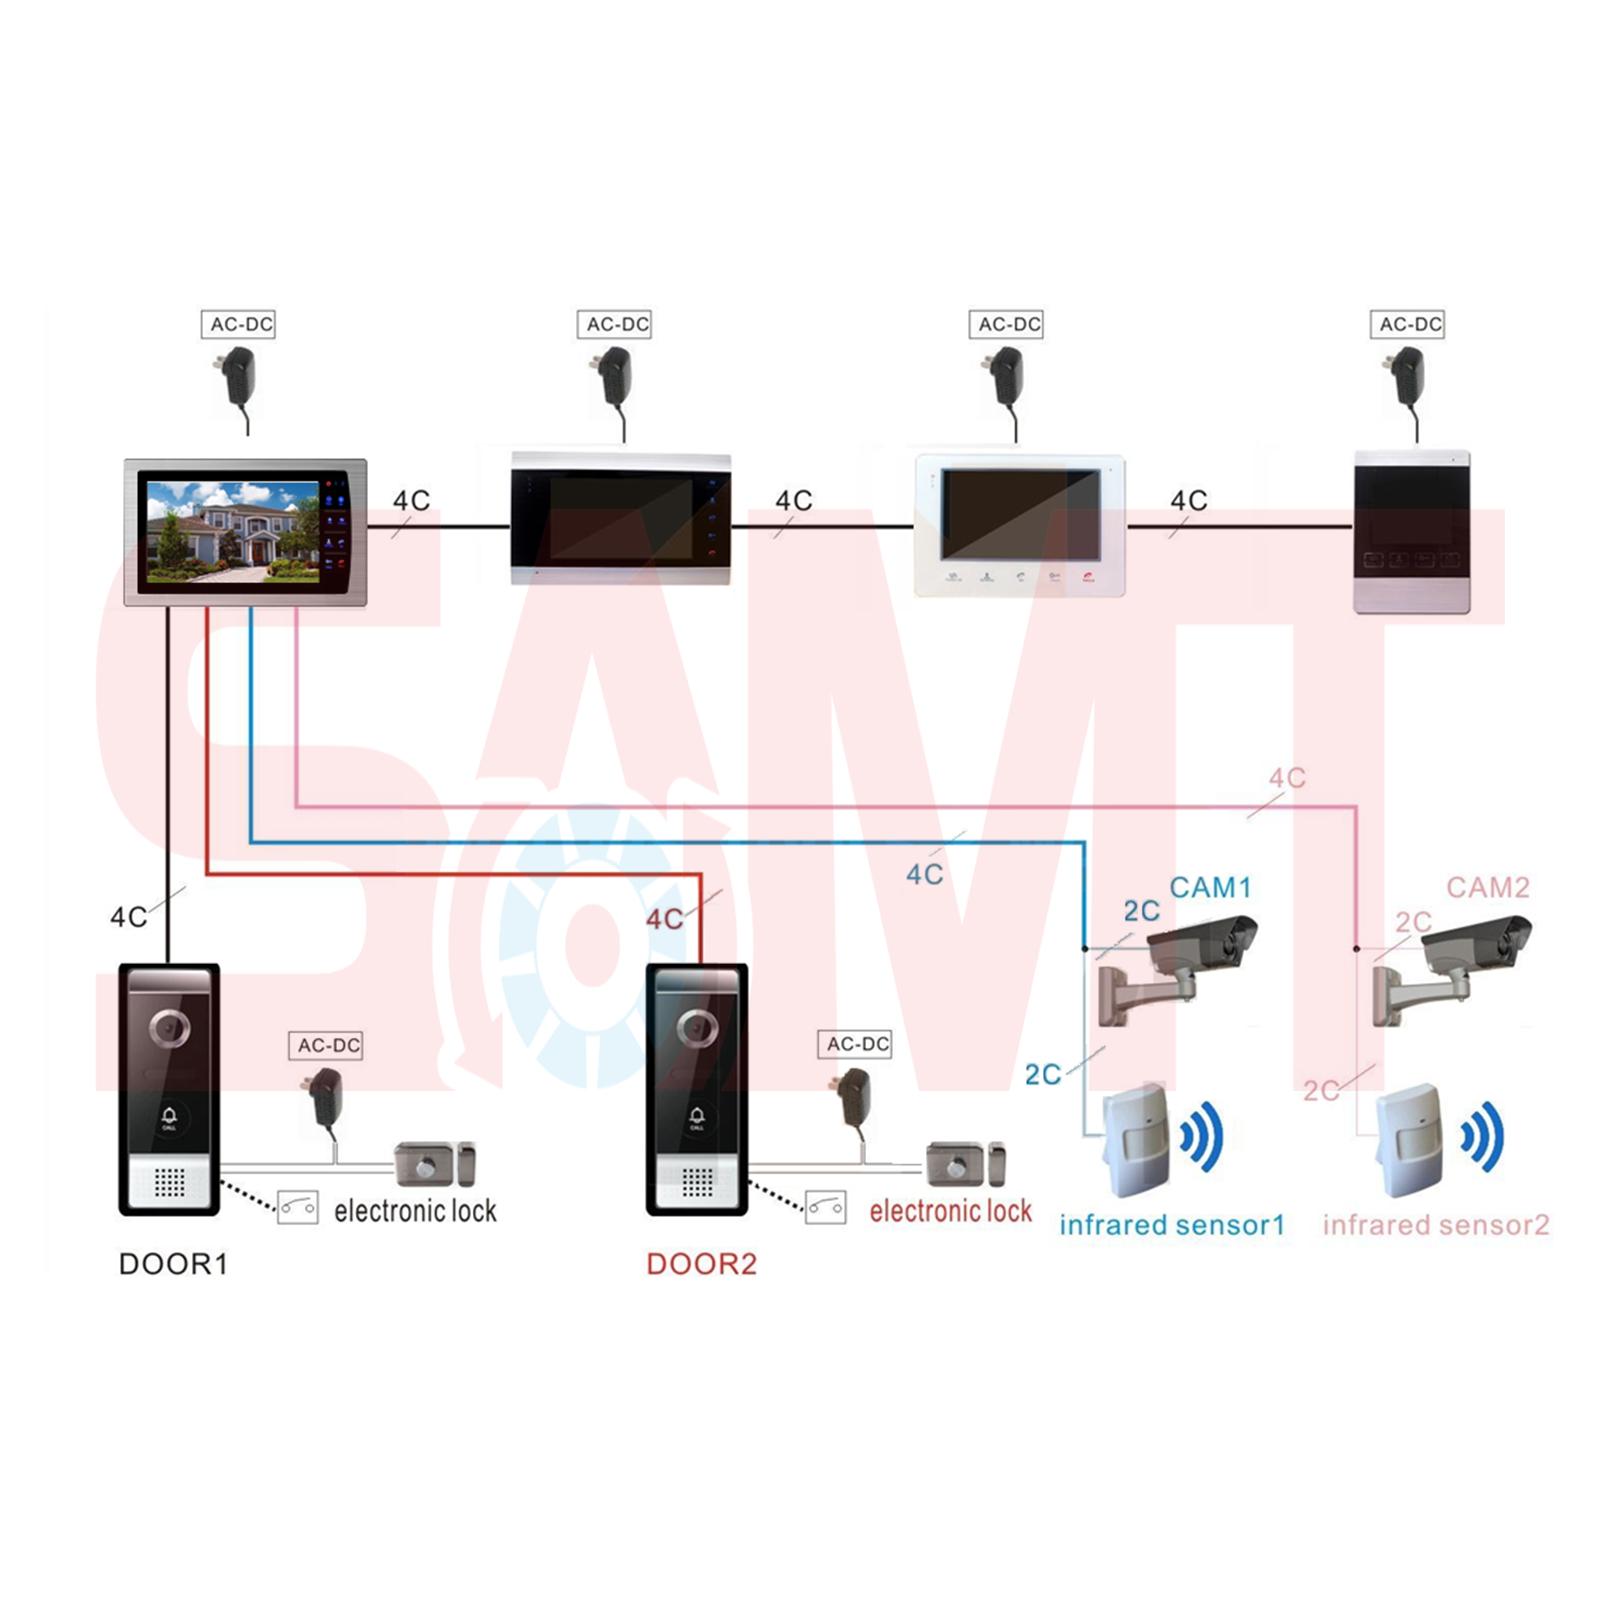 Extra New 7 White Eco Intercom Monitor Samtgatemotors Wiring Diagram 10 Inch Watermark